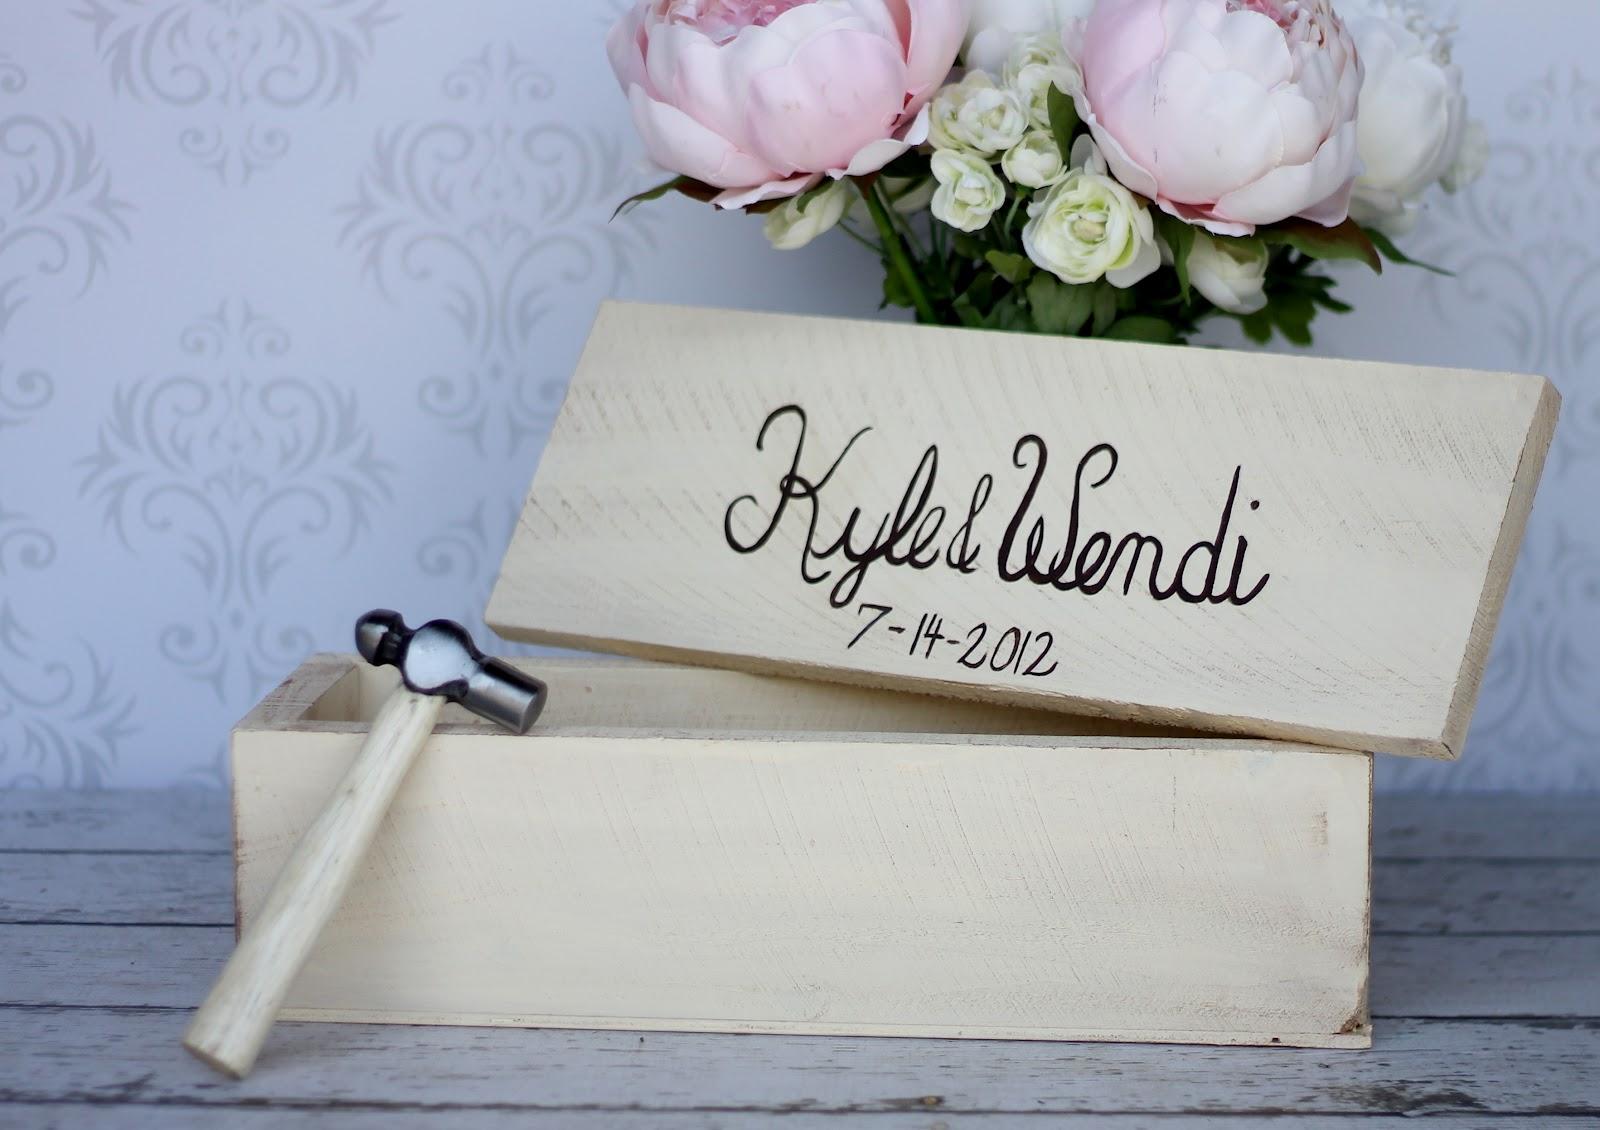 Morgann Hill Designs: Personalized Wine Box Shabby Chic Time Capsule ...